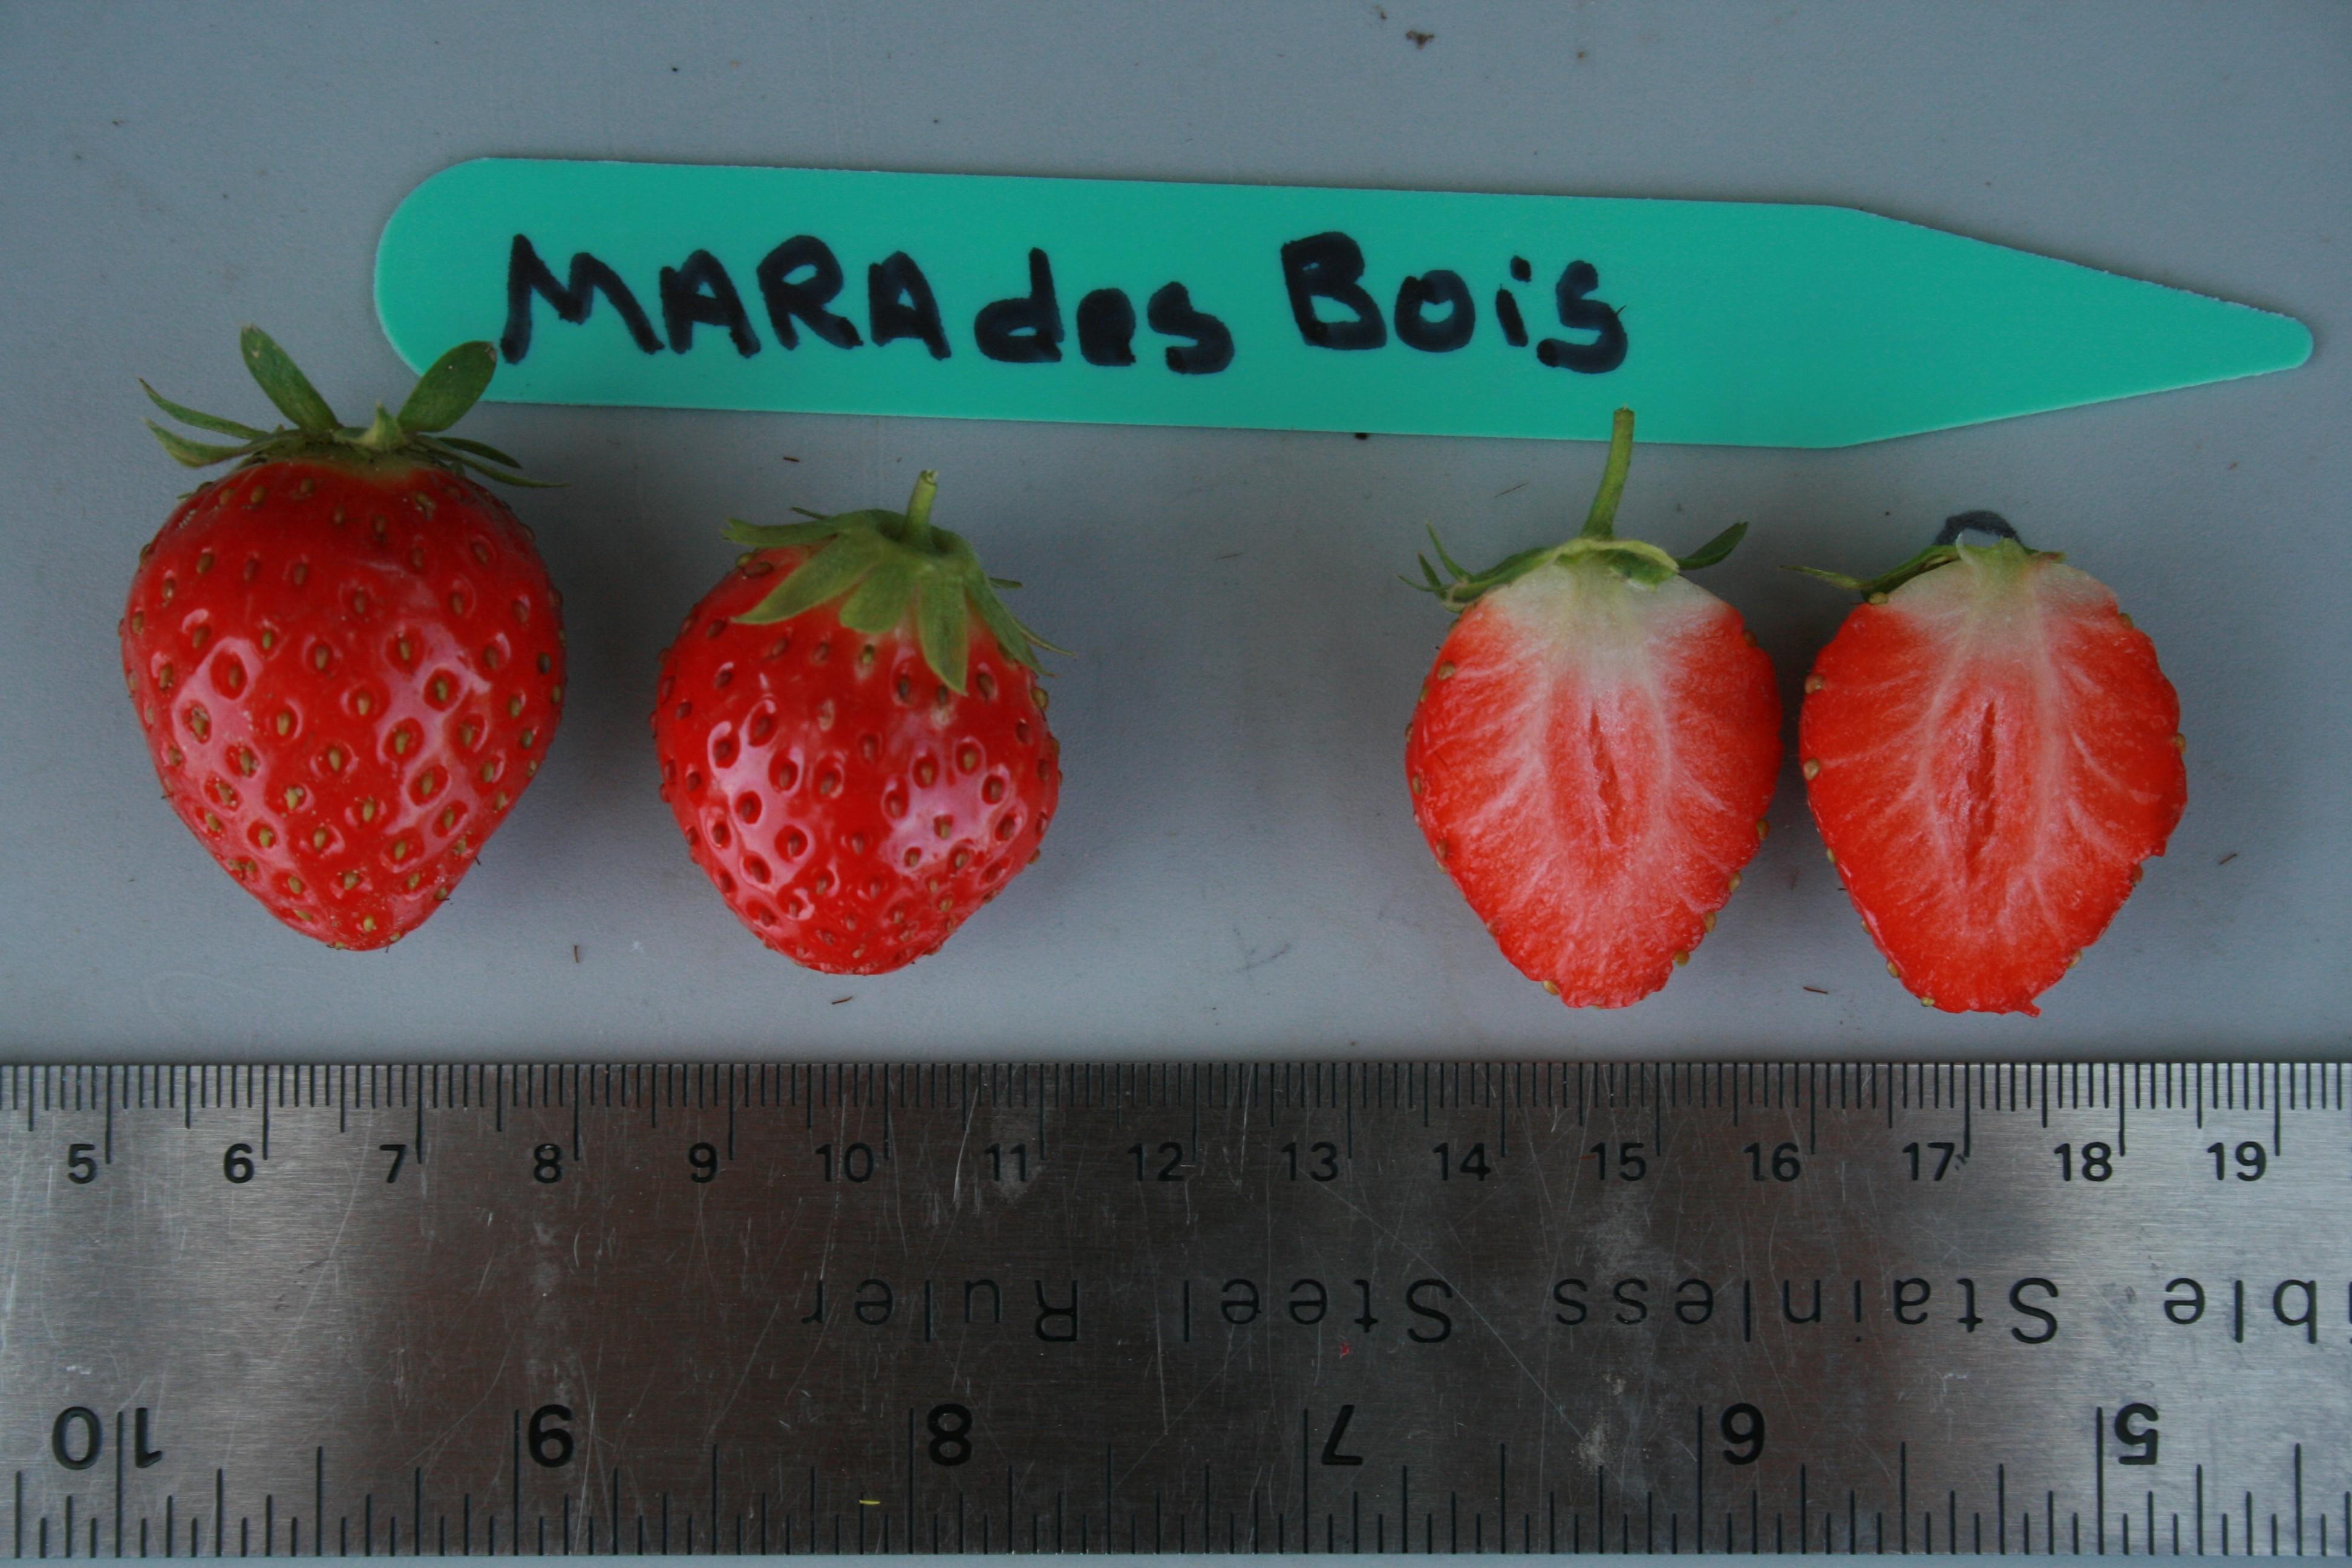 Strawberry Reference variety, Mara des Bois ~ Mara Des Bois Culture